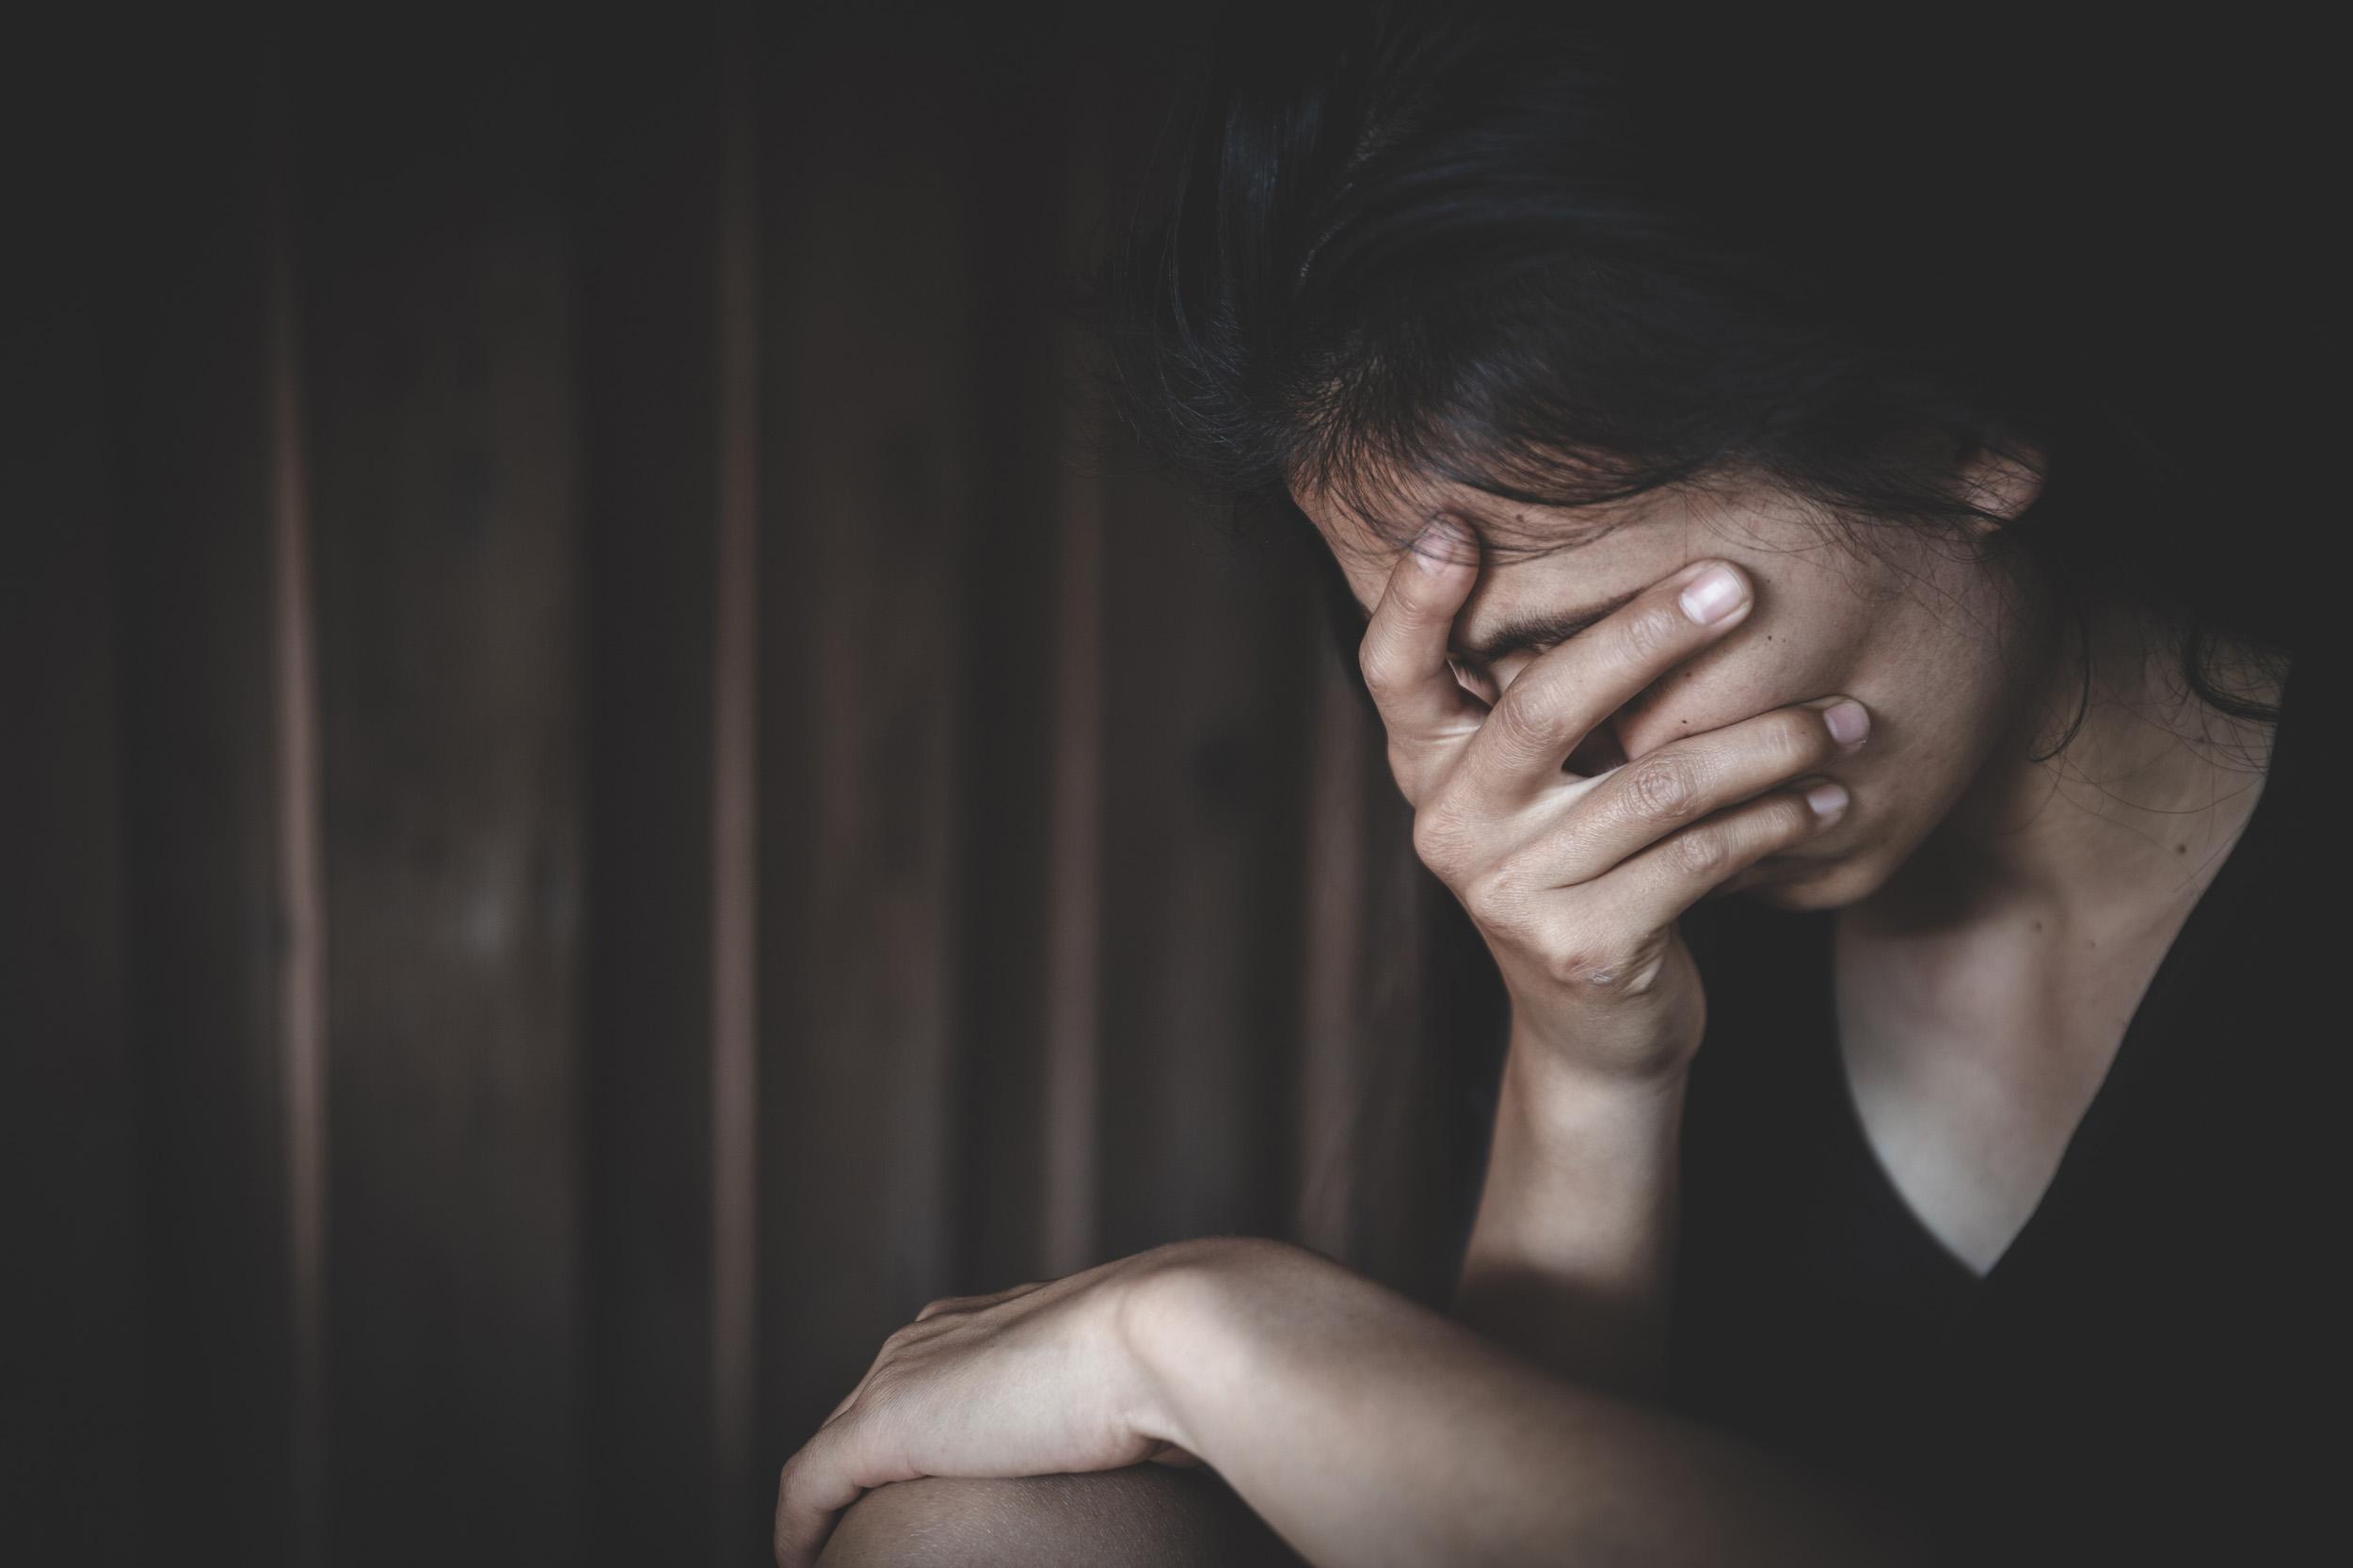 domestic abuse, domestic violence, Peel Region, Canada spousal violence survivors